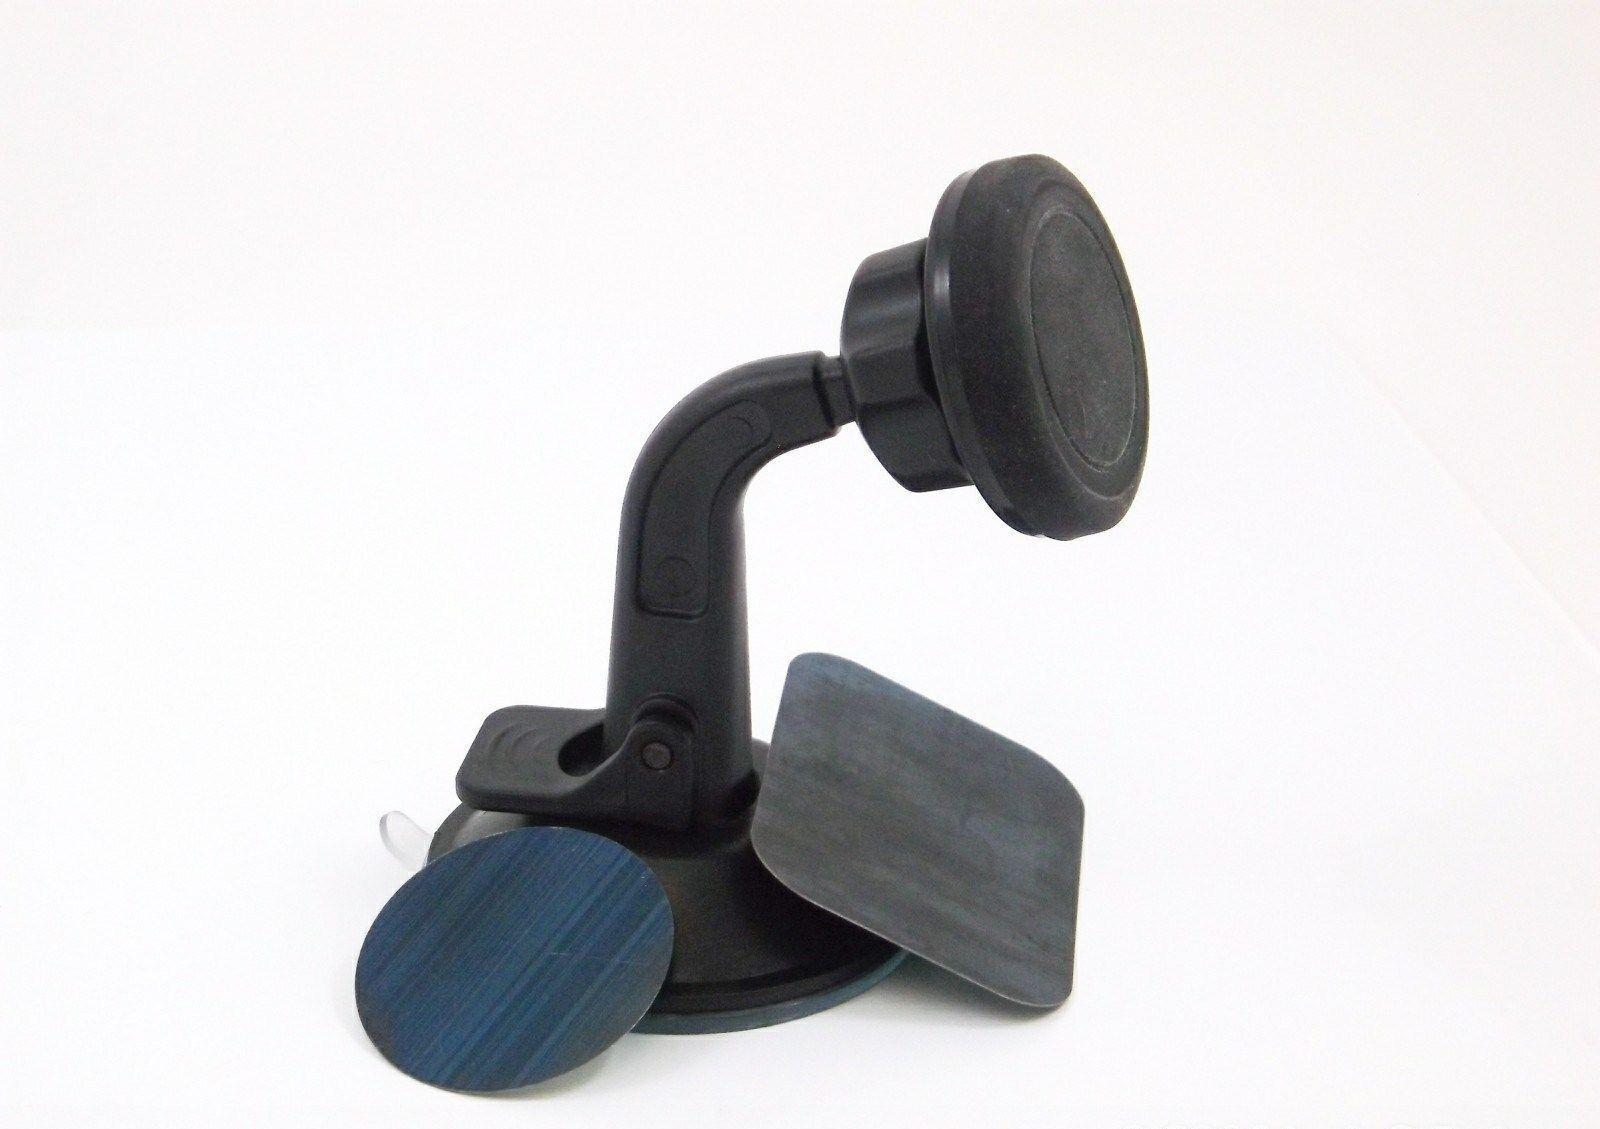 Car Universal Magnet Ball Rotation Mount Windshield Dashboard Phone 360° Holder